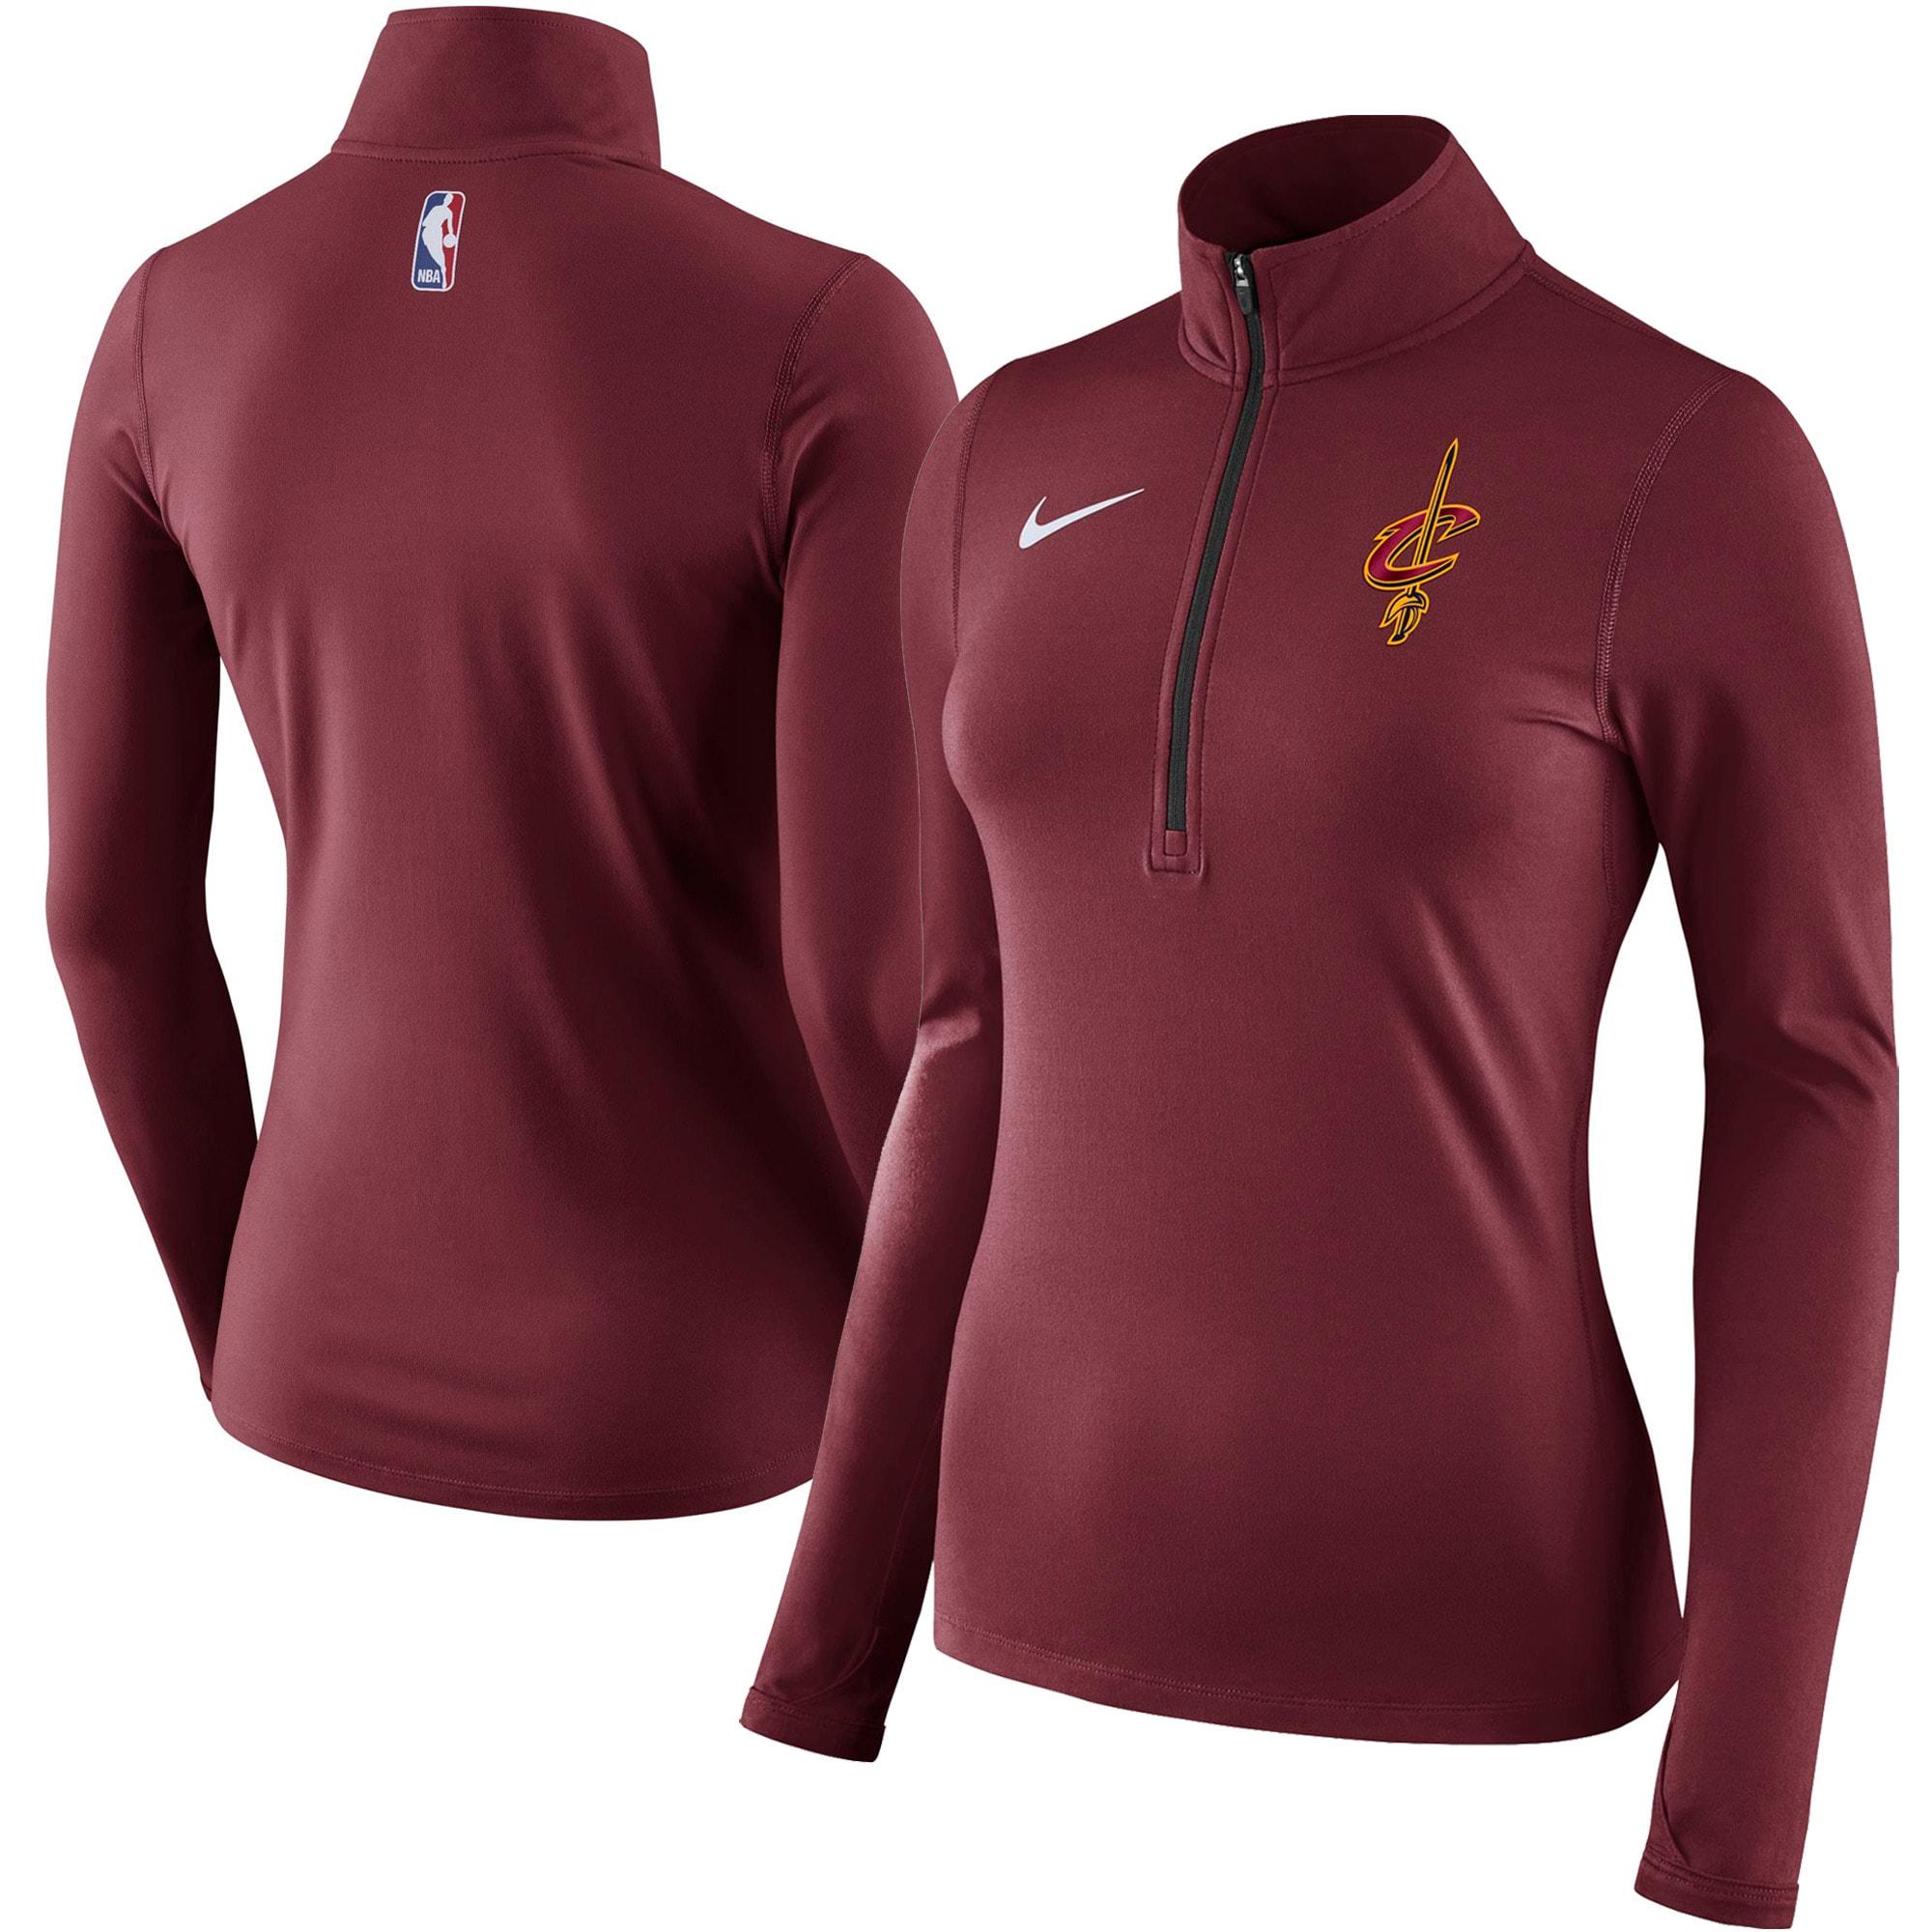 Cleveland Cavaliers Nike Women's Element Quarter-Zip Jacket - Wine